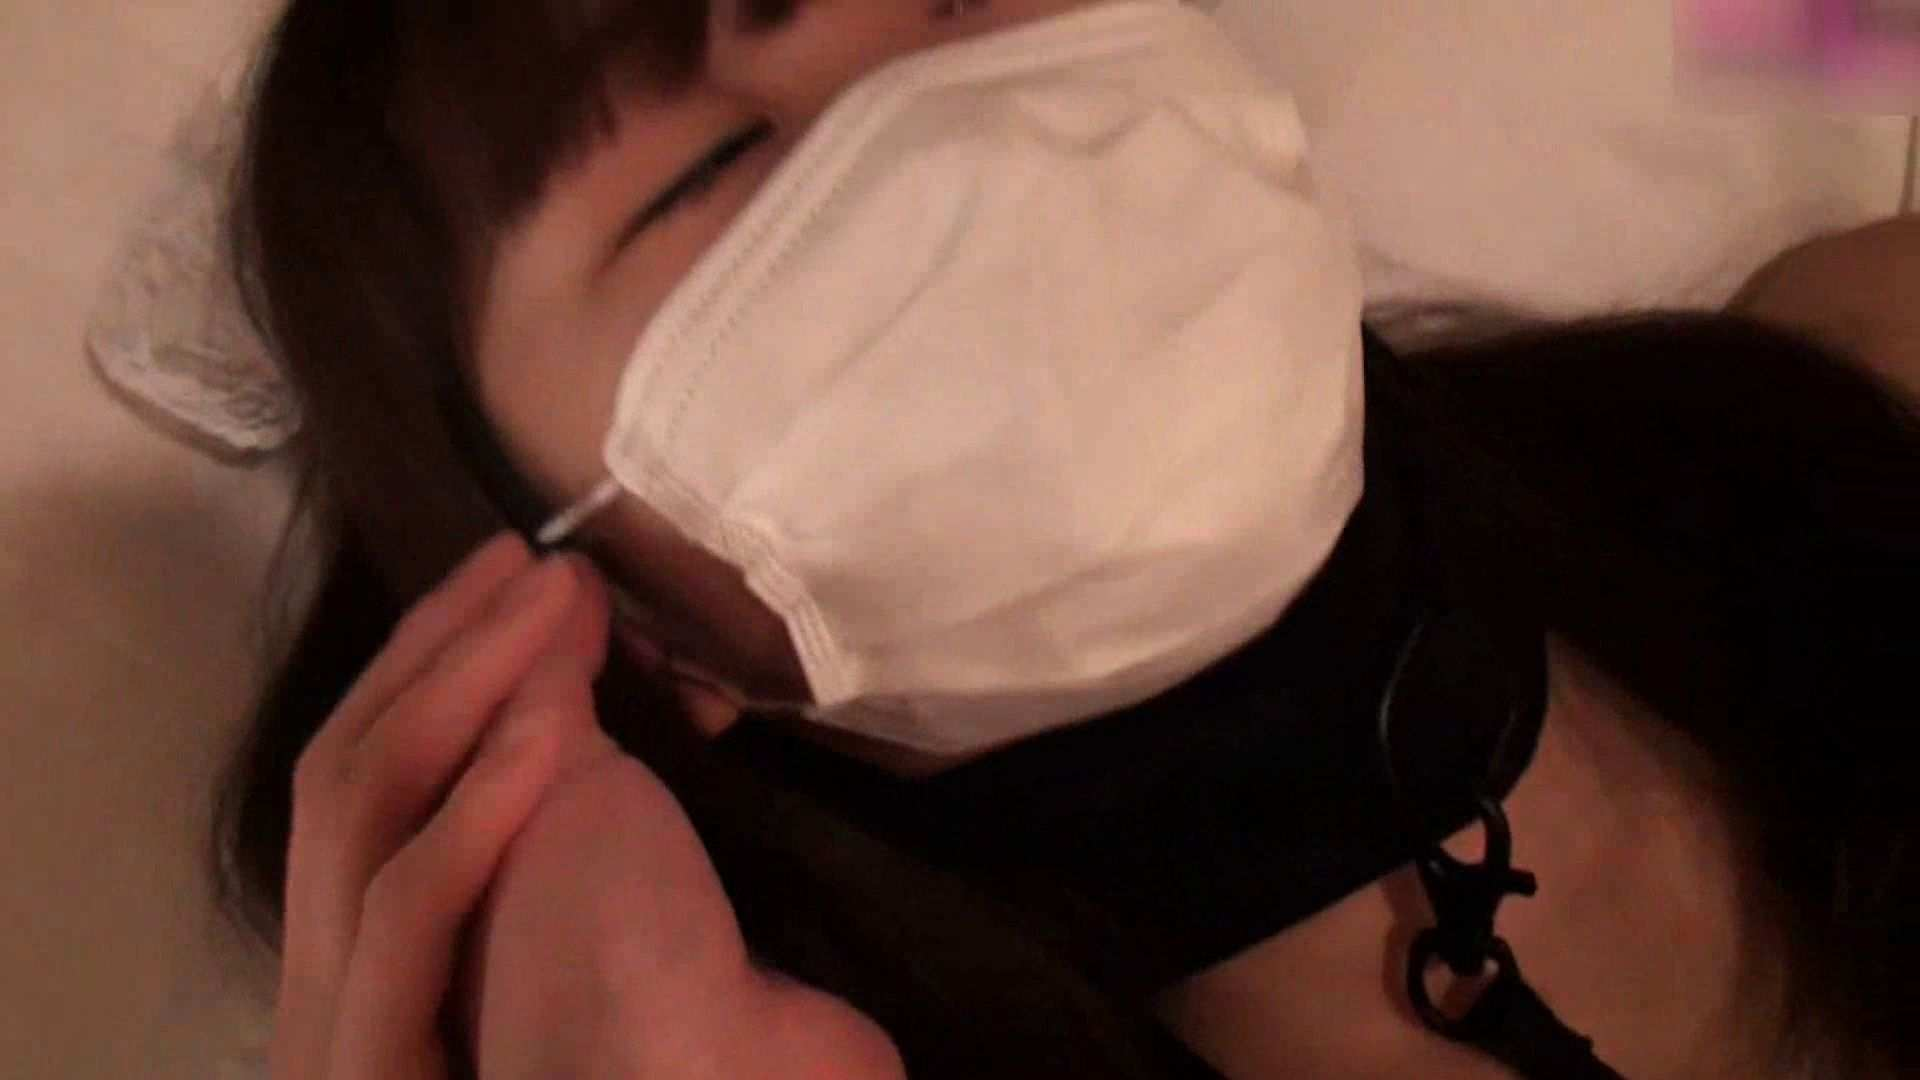 S級厳選美女ビッチガールVol.23 セックス  103枚 29